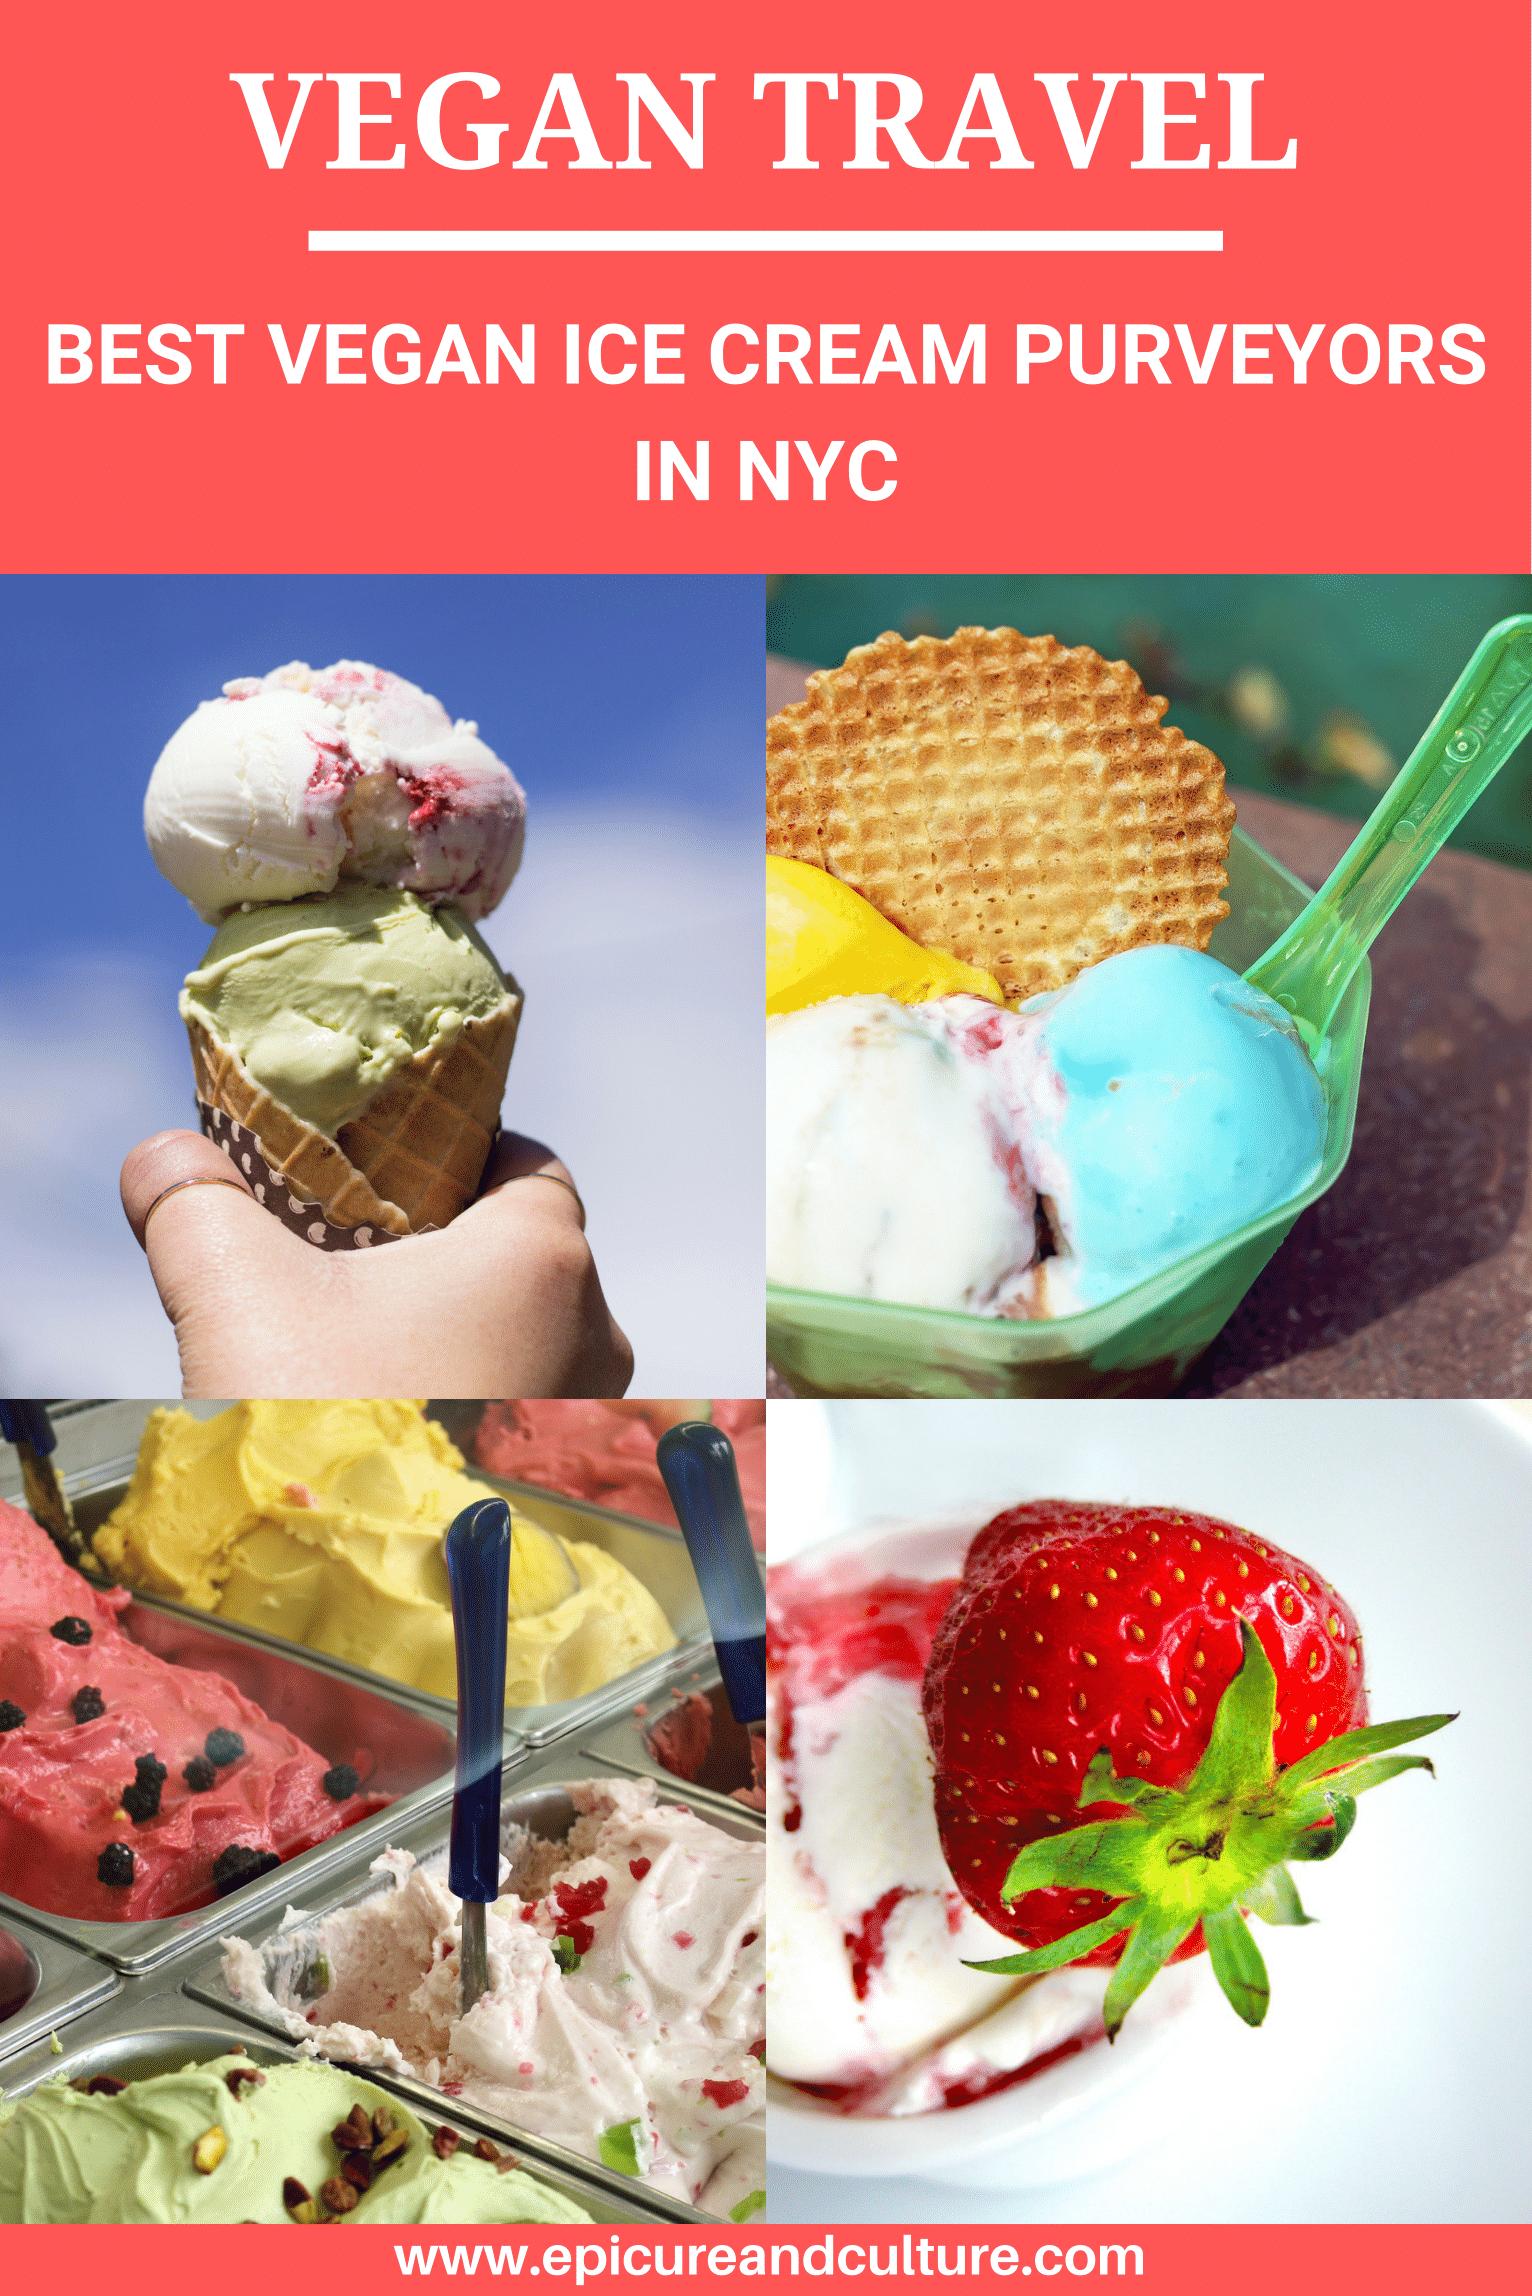 Epicure S Guide To Nyc S Vegan Ice Cream Purveyors Best Vegan Ice Cream Vegan Ice Cream Vegan Ice Cream Nyc